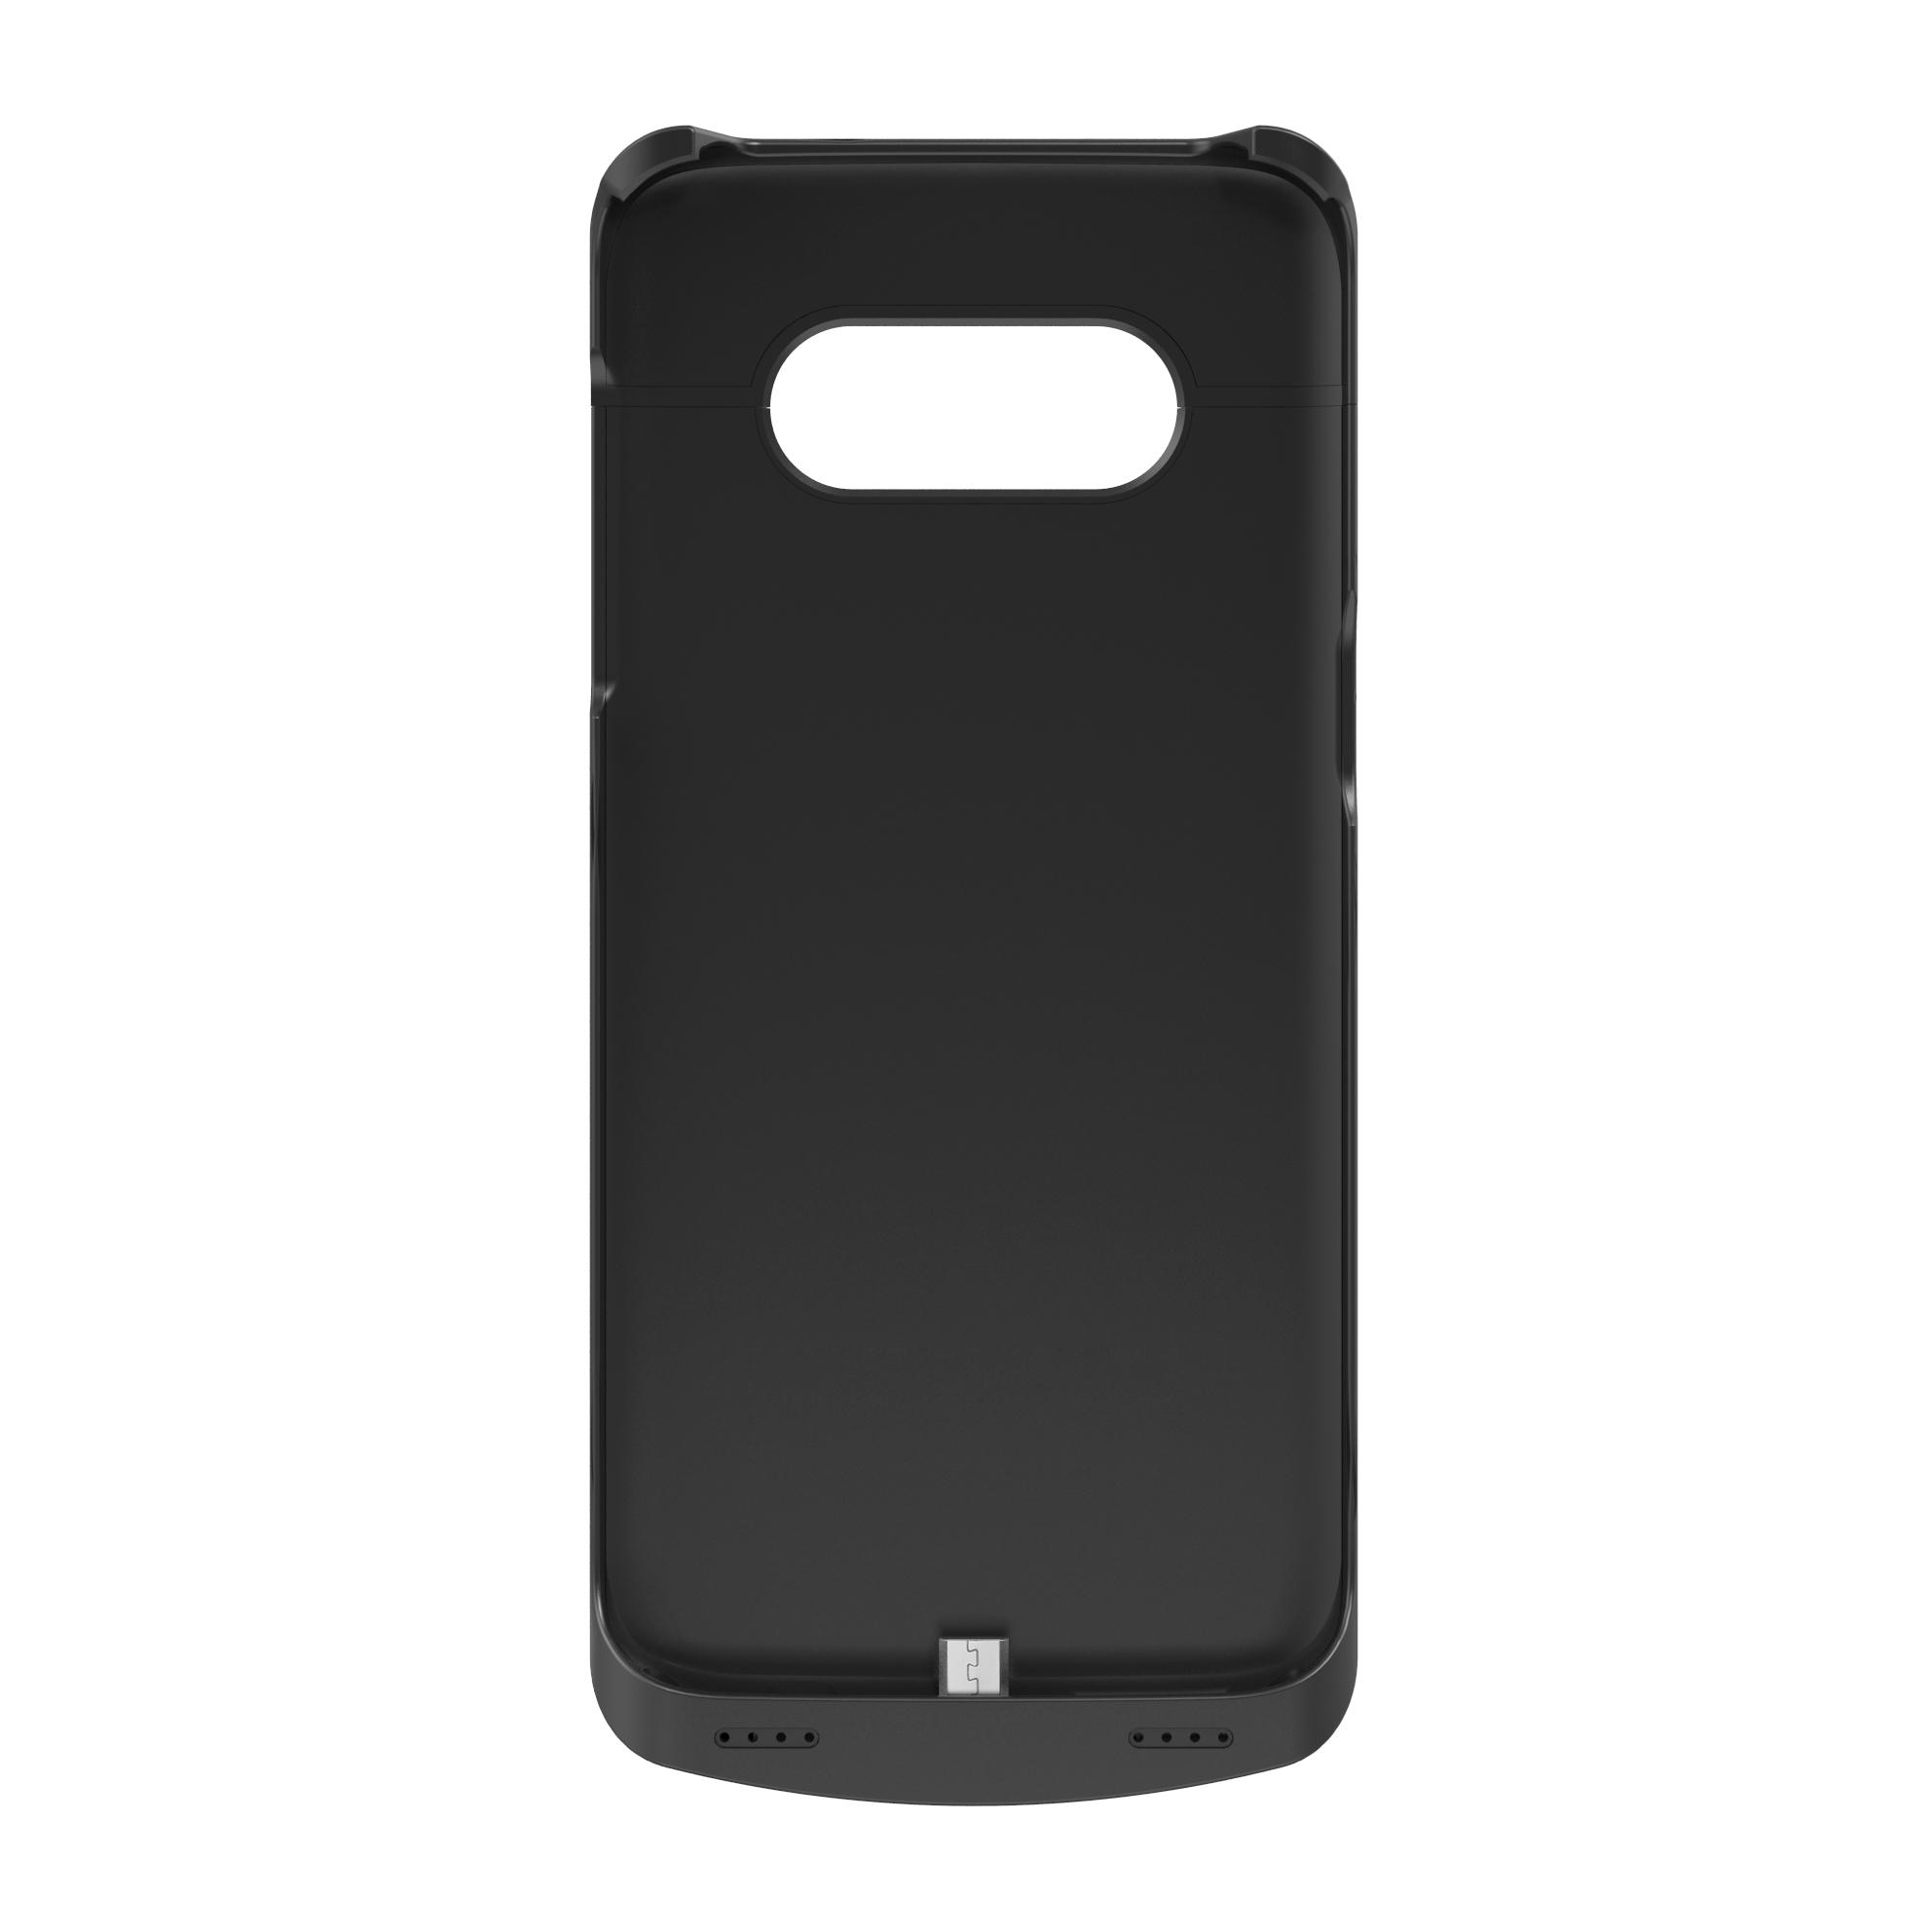 newest 2f270 86914 Galaxy S7 Edge Battery Case (Black)